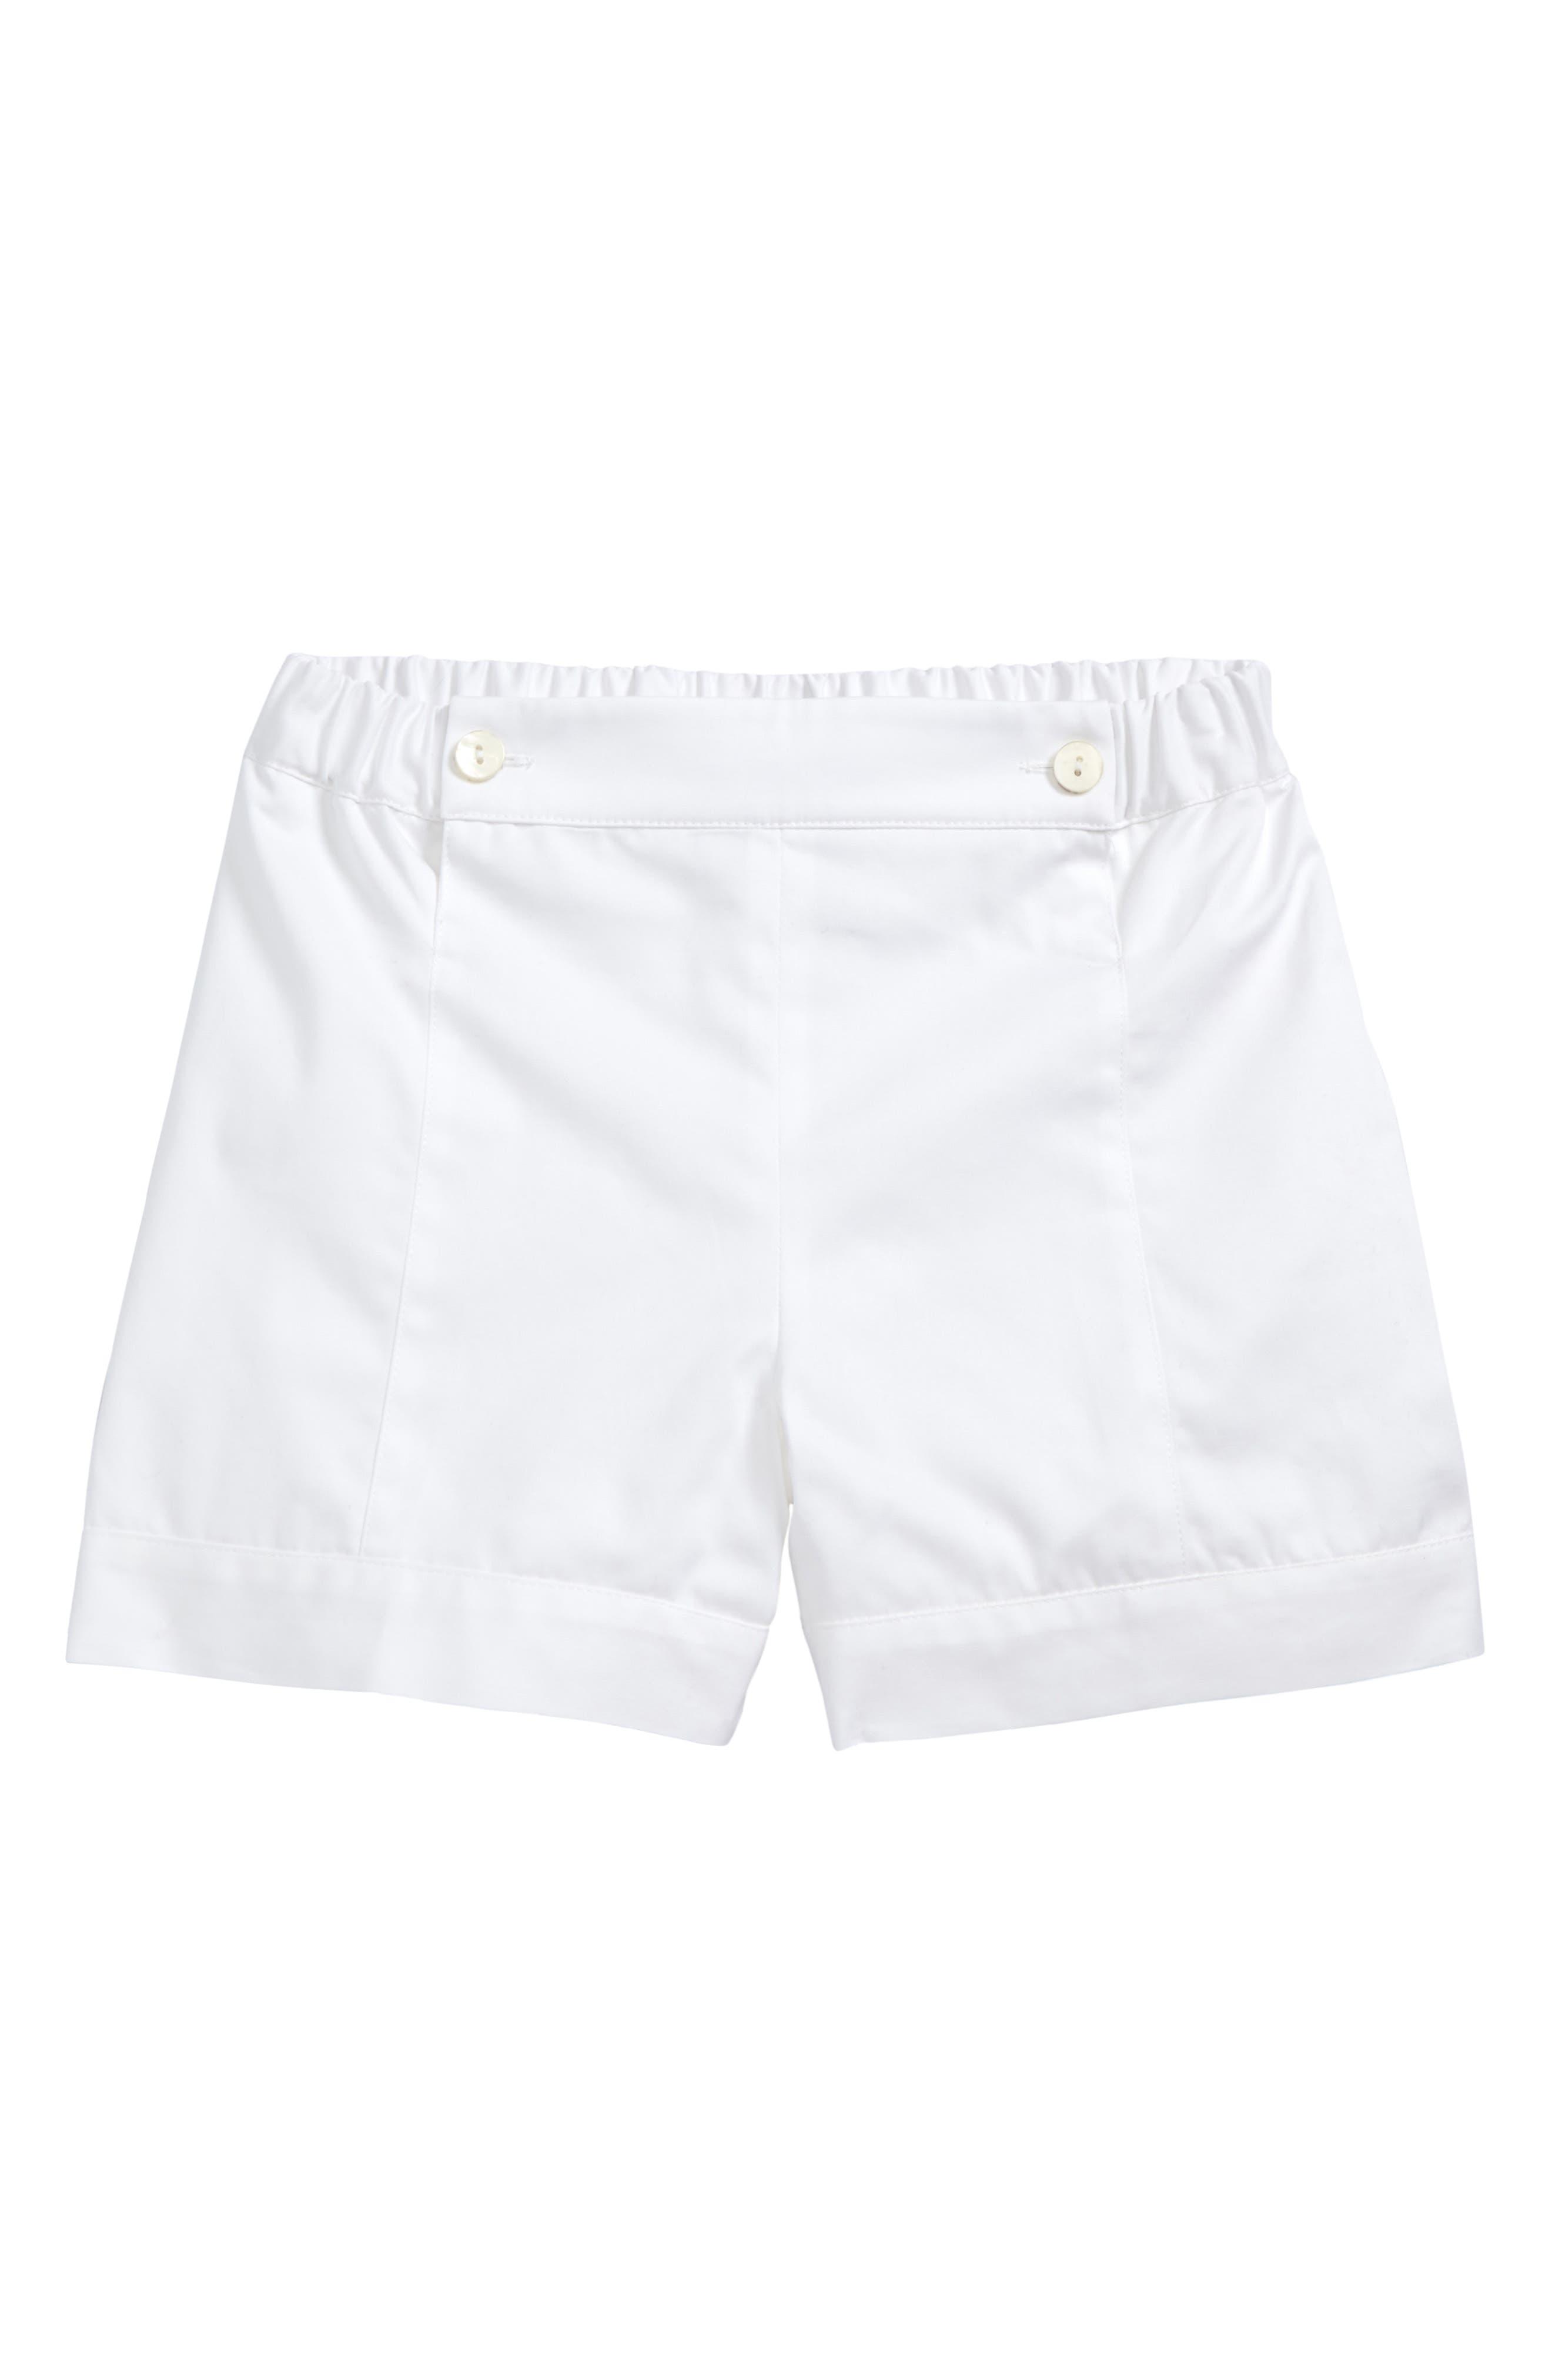 Sailor Shorts,                         Main,                         color, White